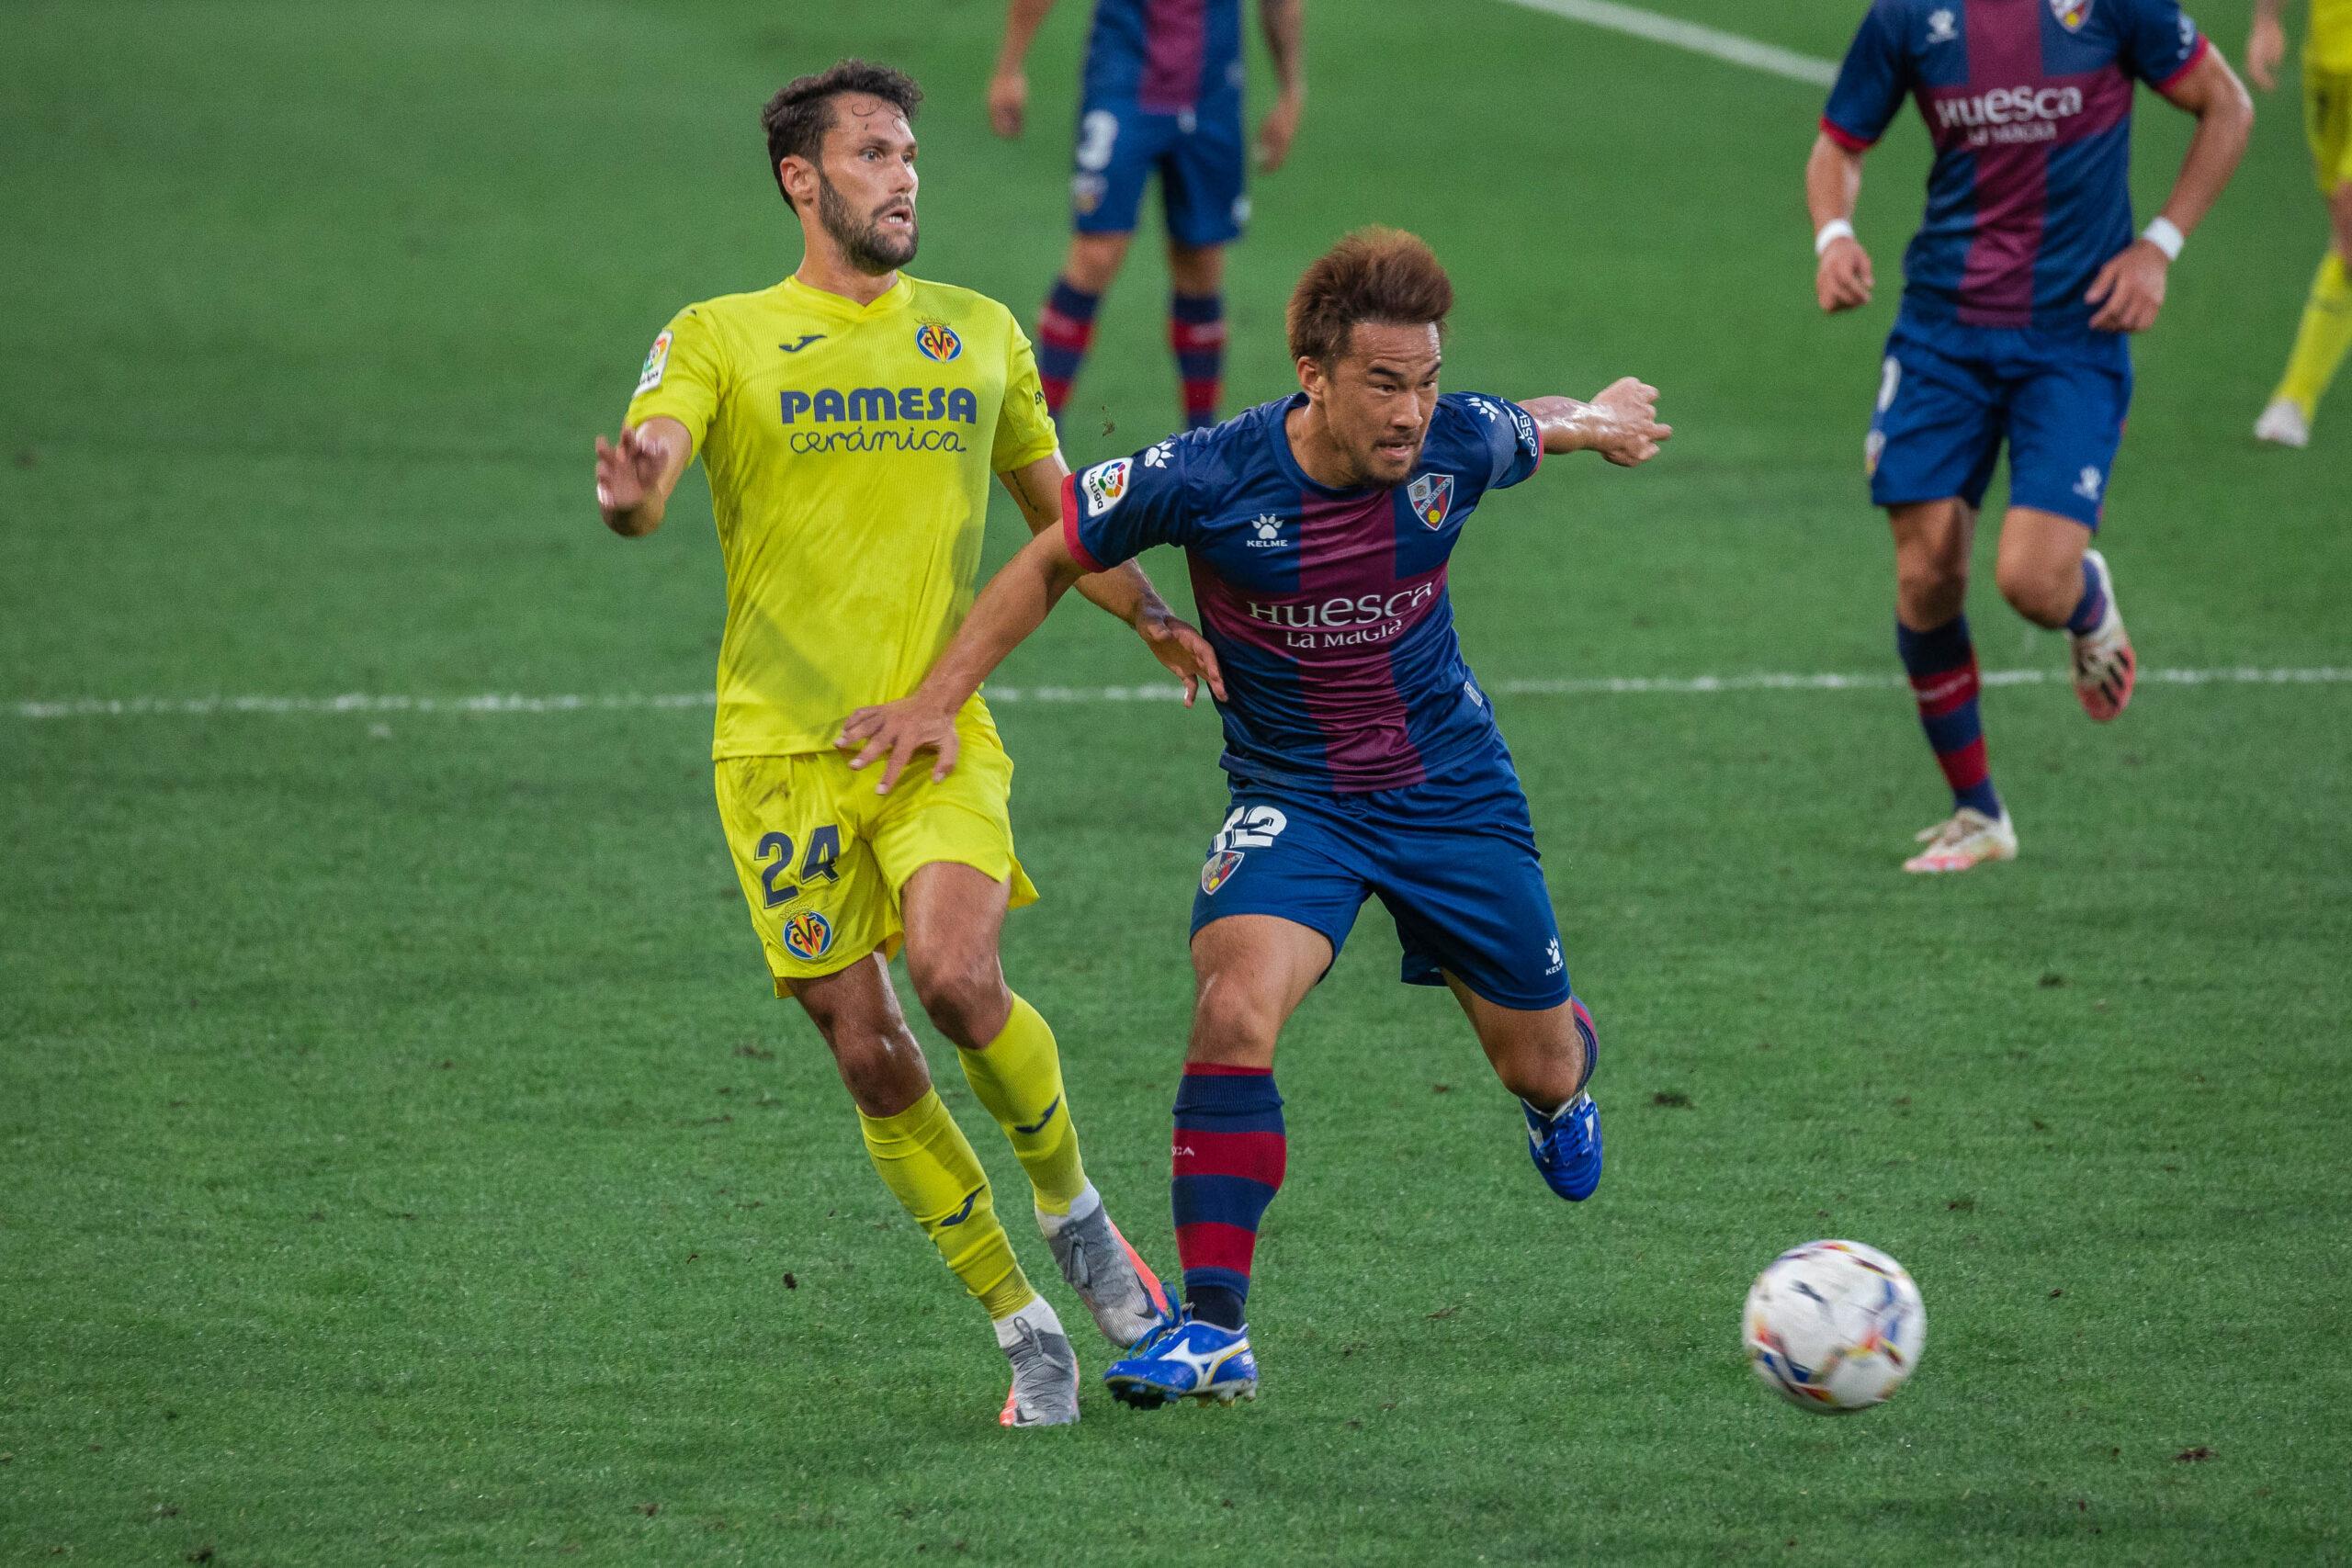 Cara a Cara: SD Huesca – Villarreal CF